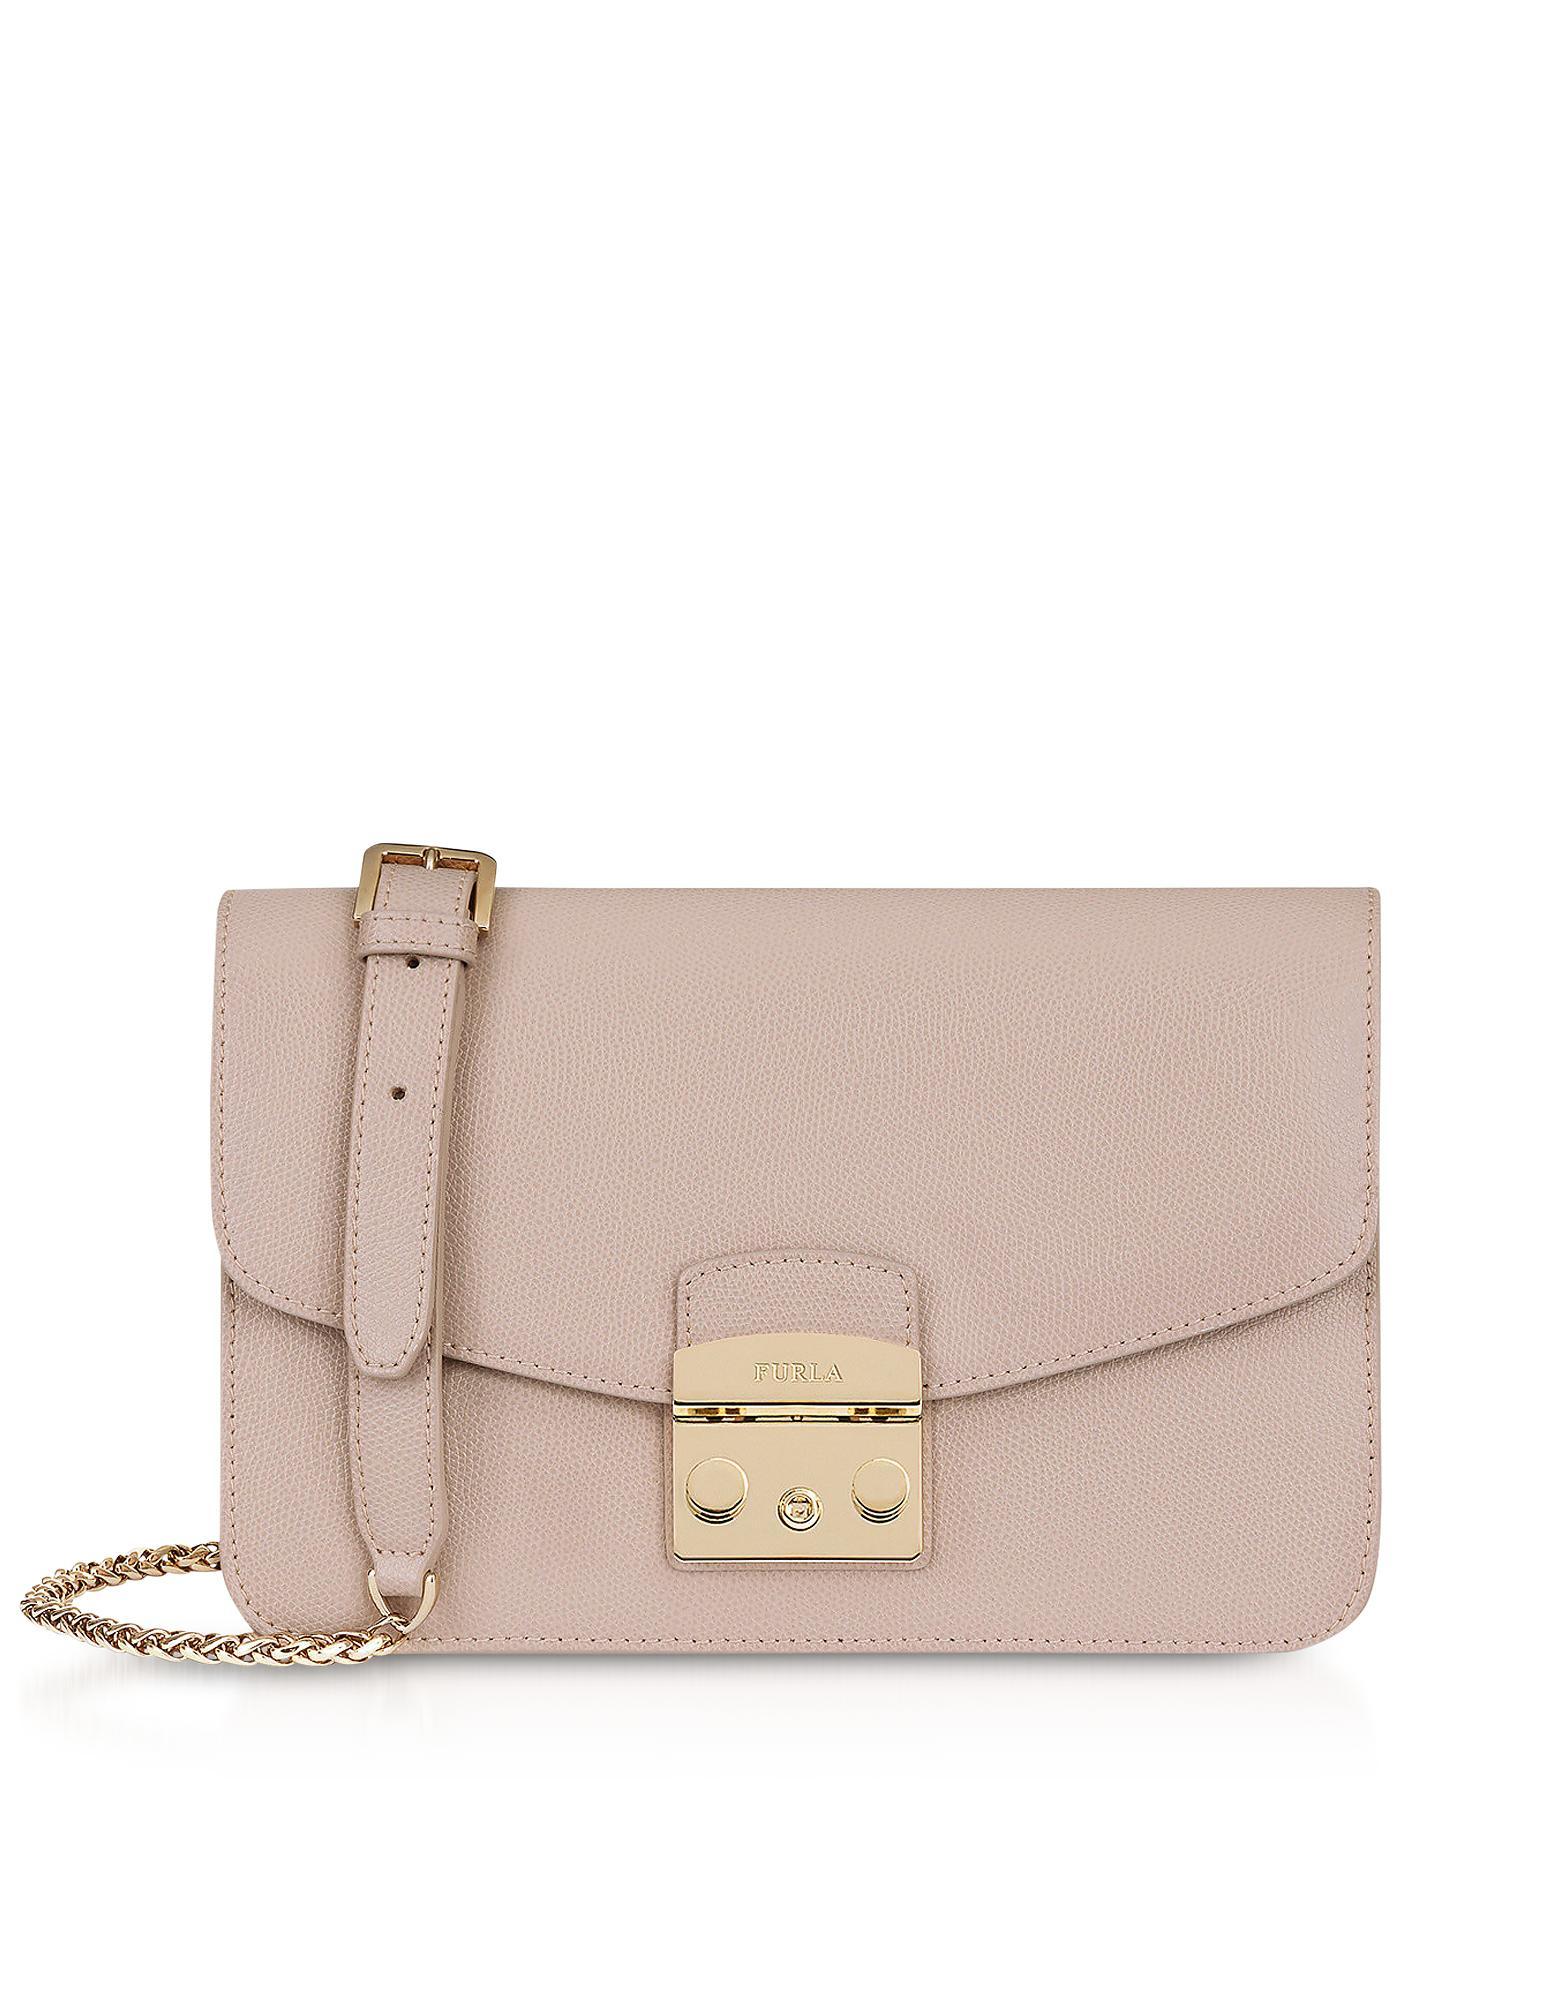 73e58c5ab54e3 Lyst - Furla Dalia Metropolis S Shoulder Bag in Pink